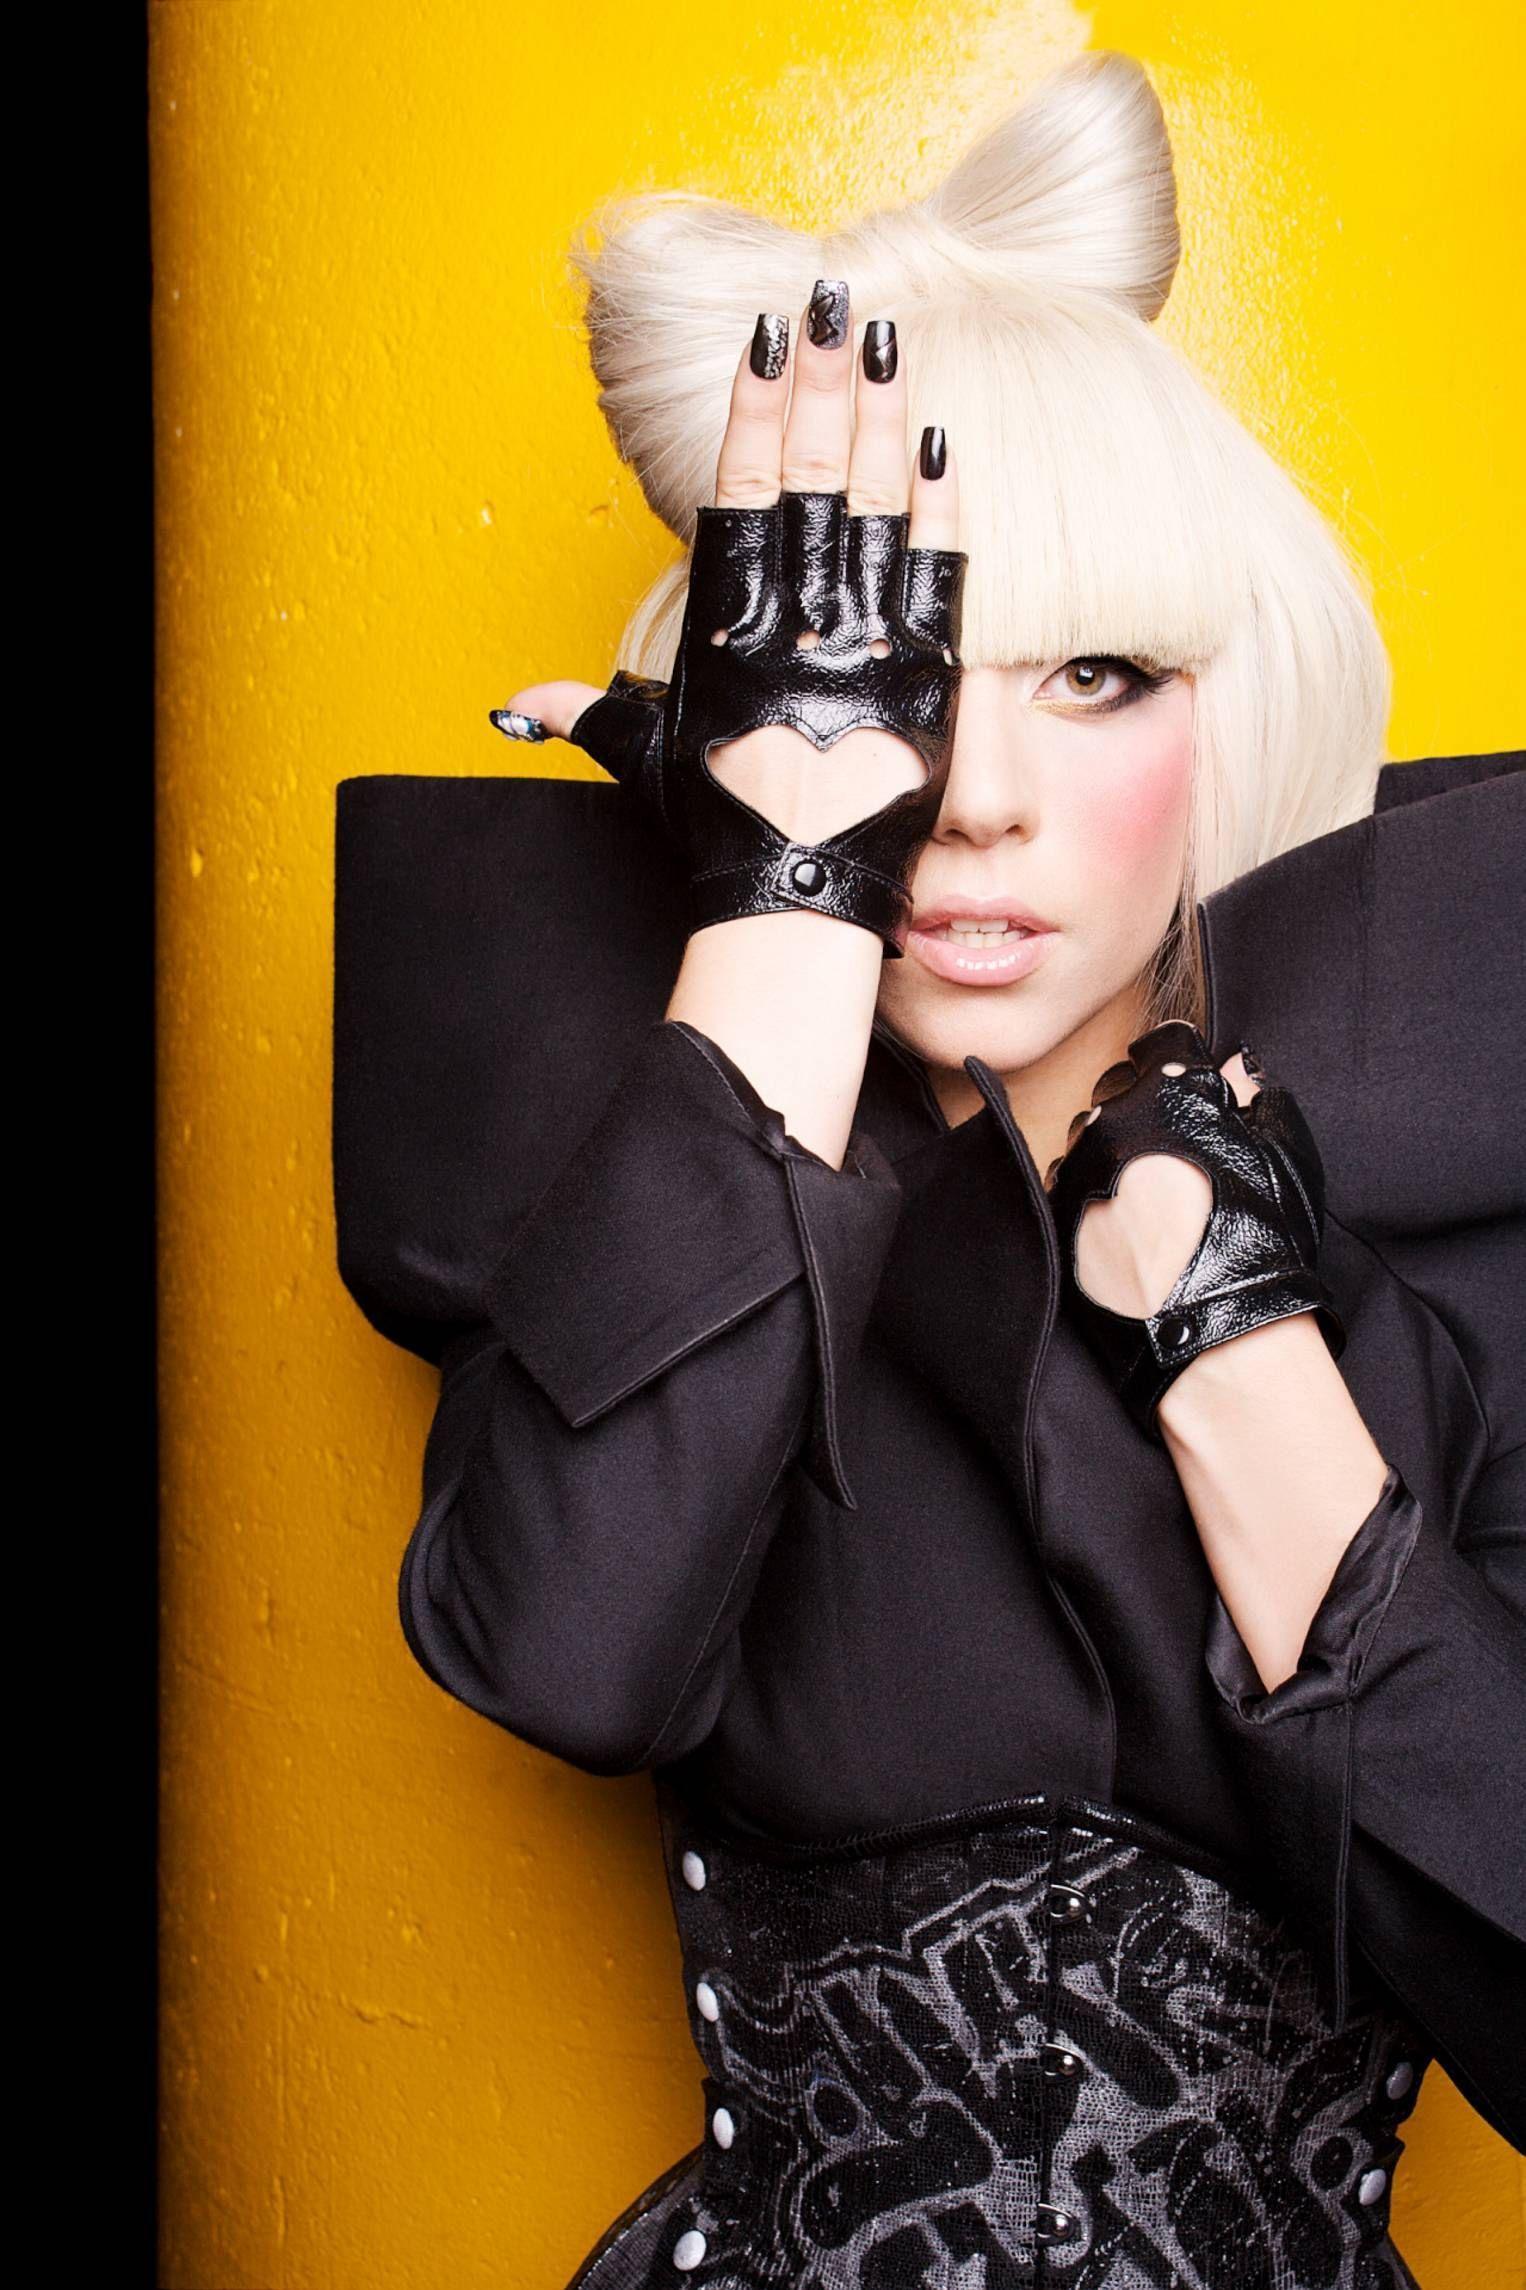 Lady Gaga Wearing Graffiti Corset.jpg